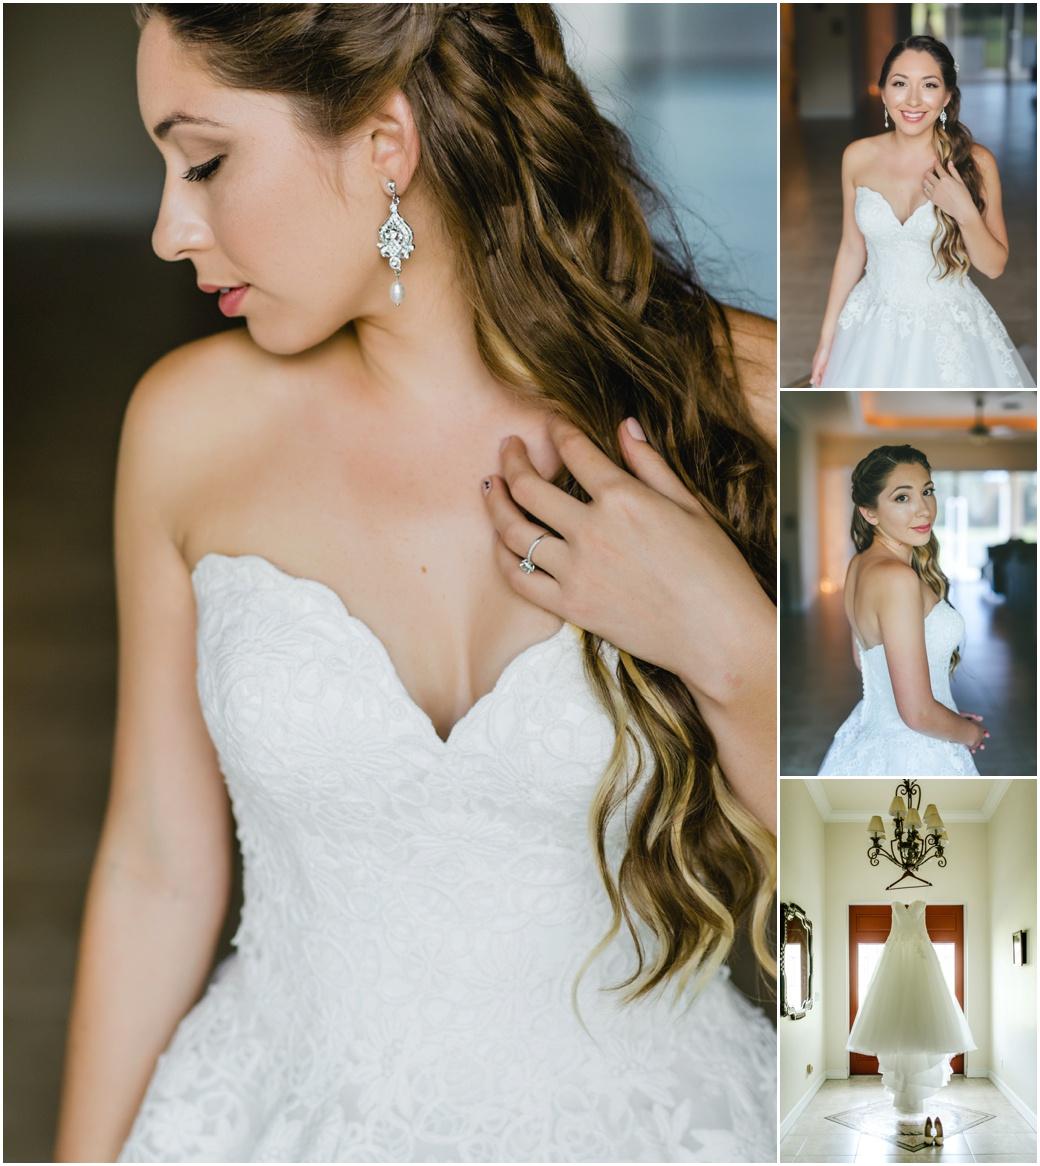 Dalziel-ft-myers-wedding-photography-5